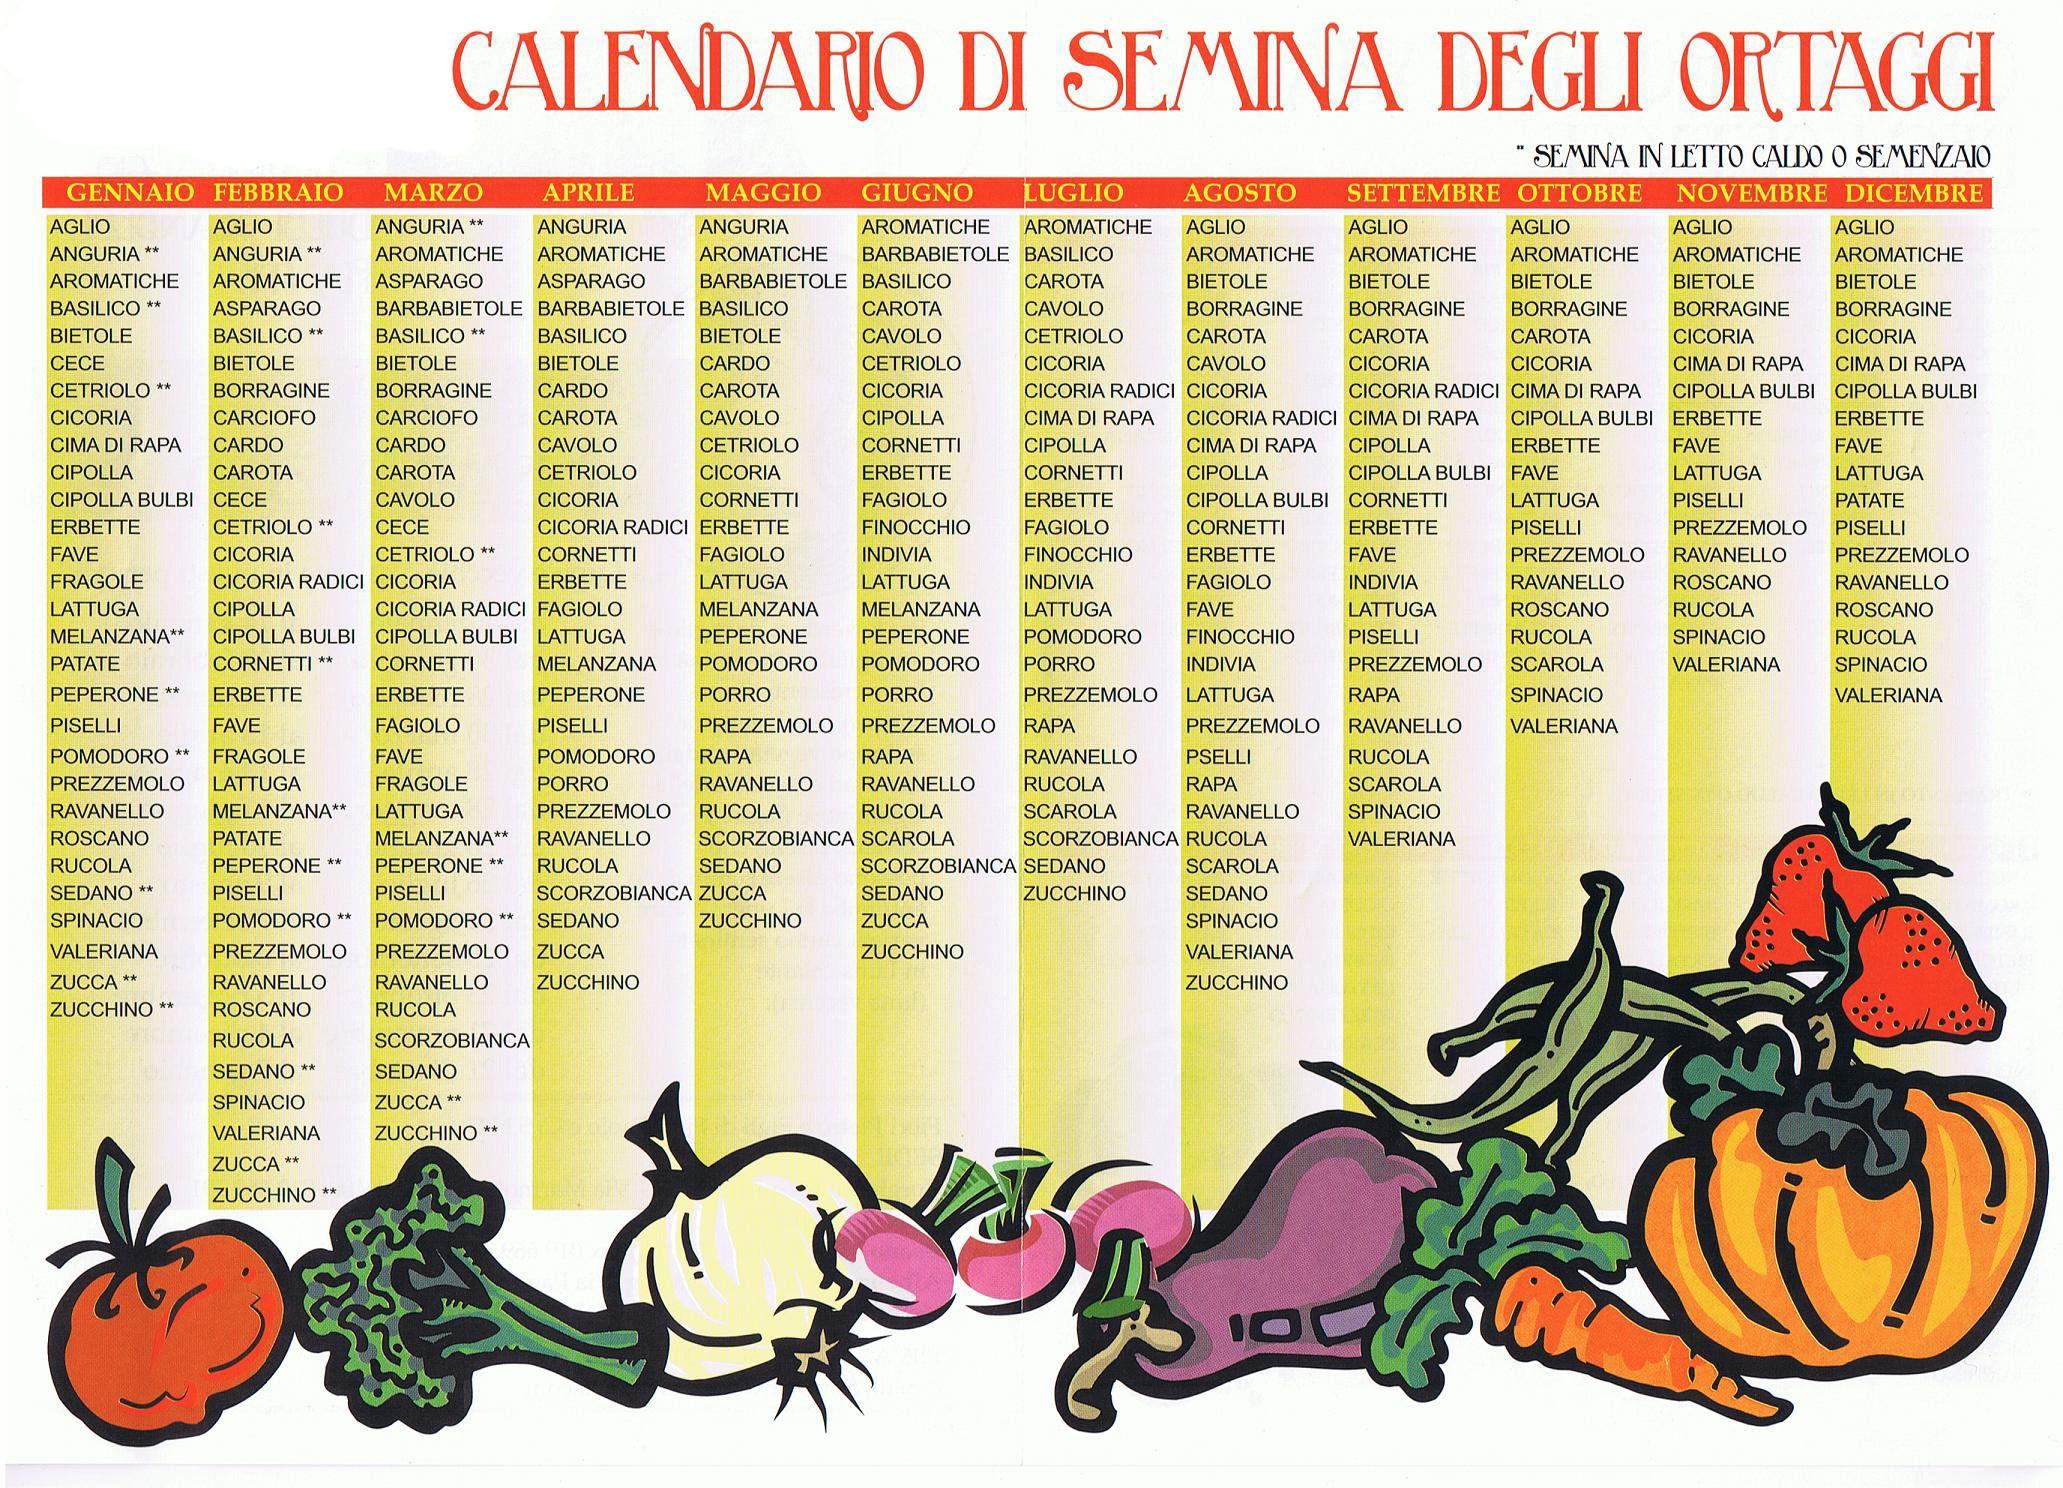 Calendario Lunare Orto.Calendario Lunare Orto Calendario 2020